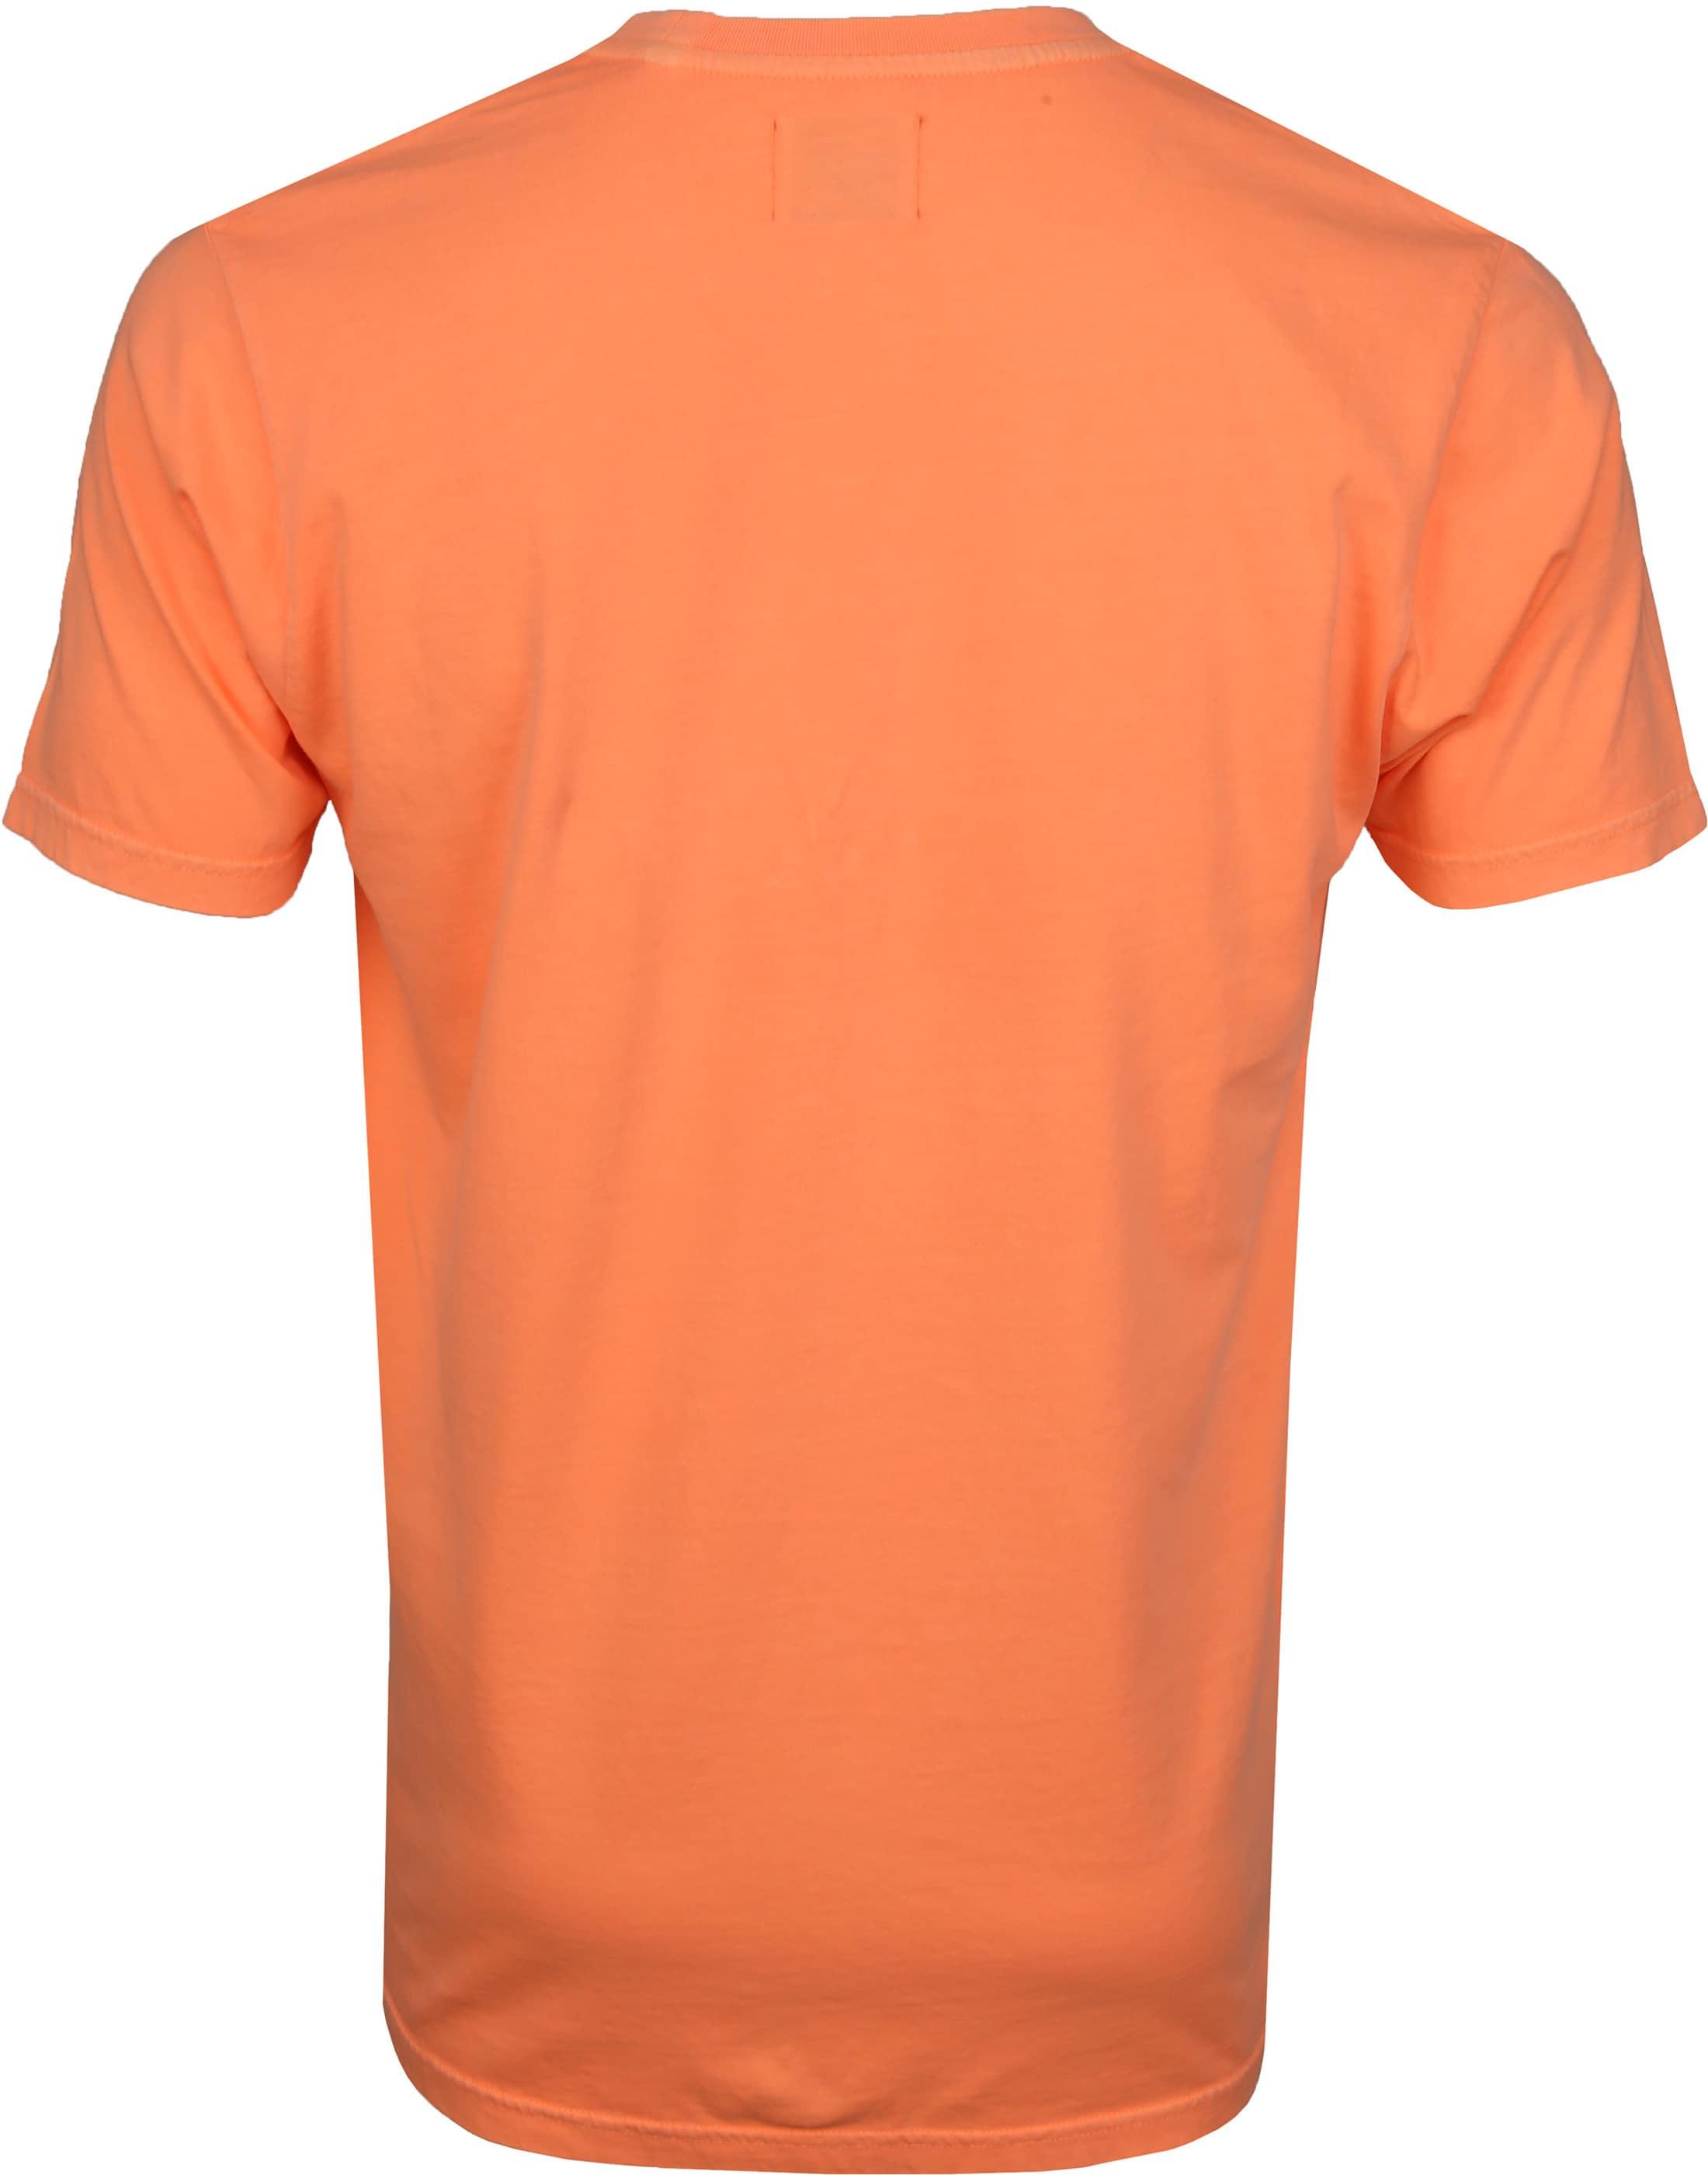 Colorful Standard T-shirt Neon Orange foto 3